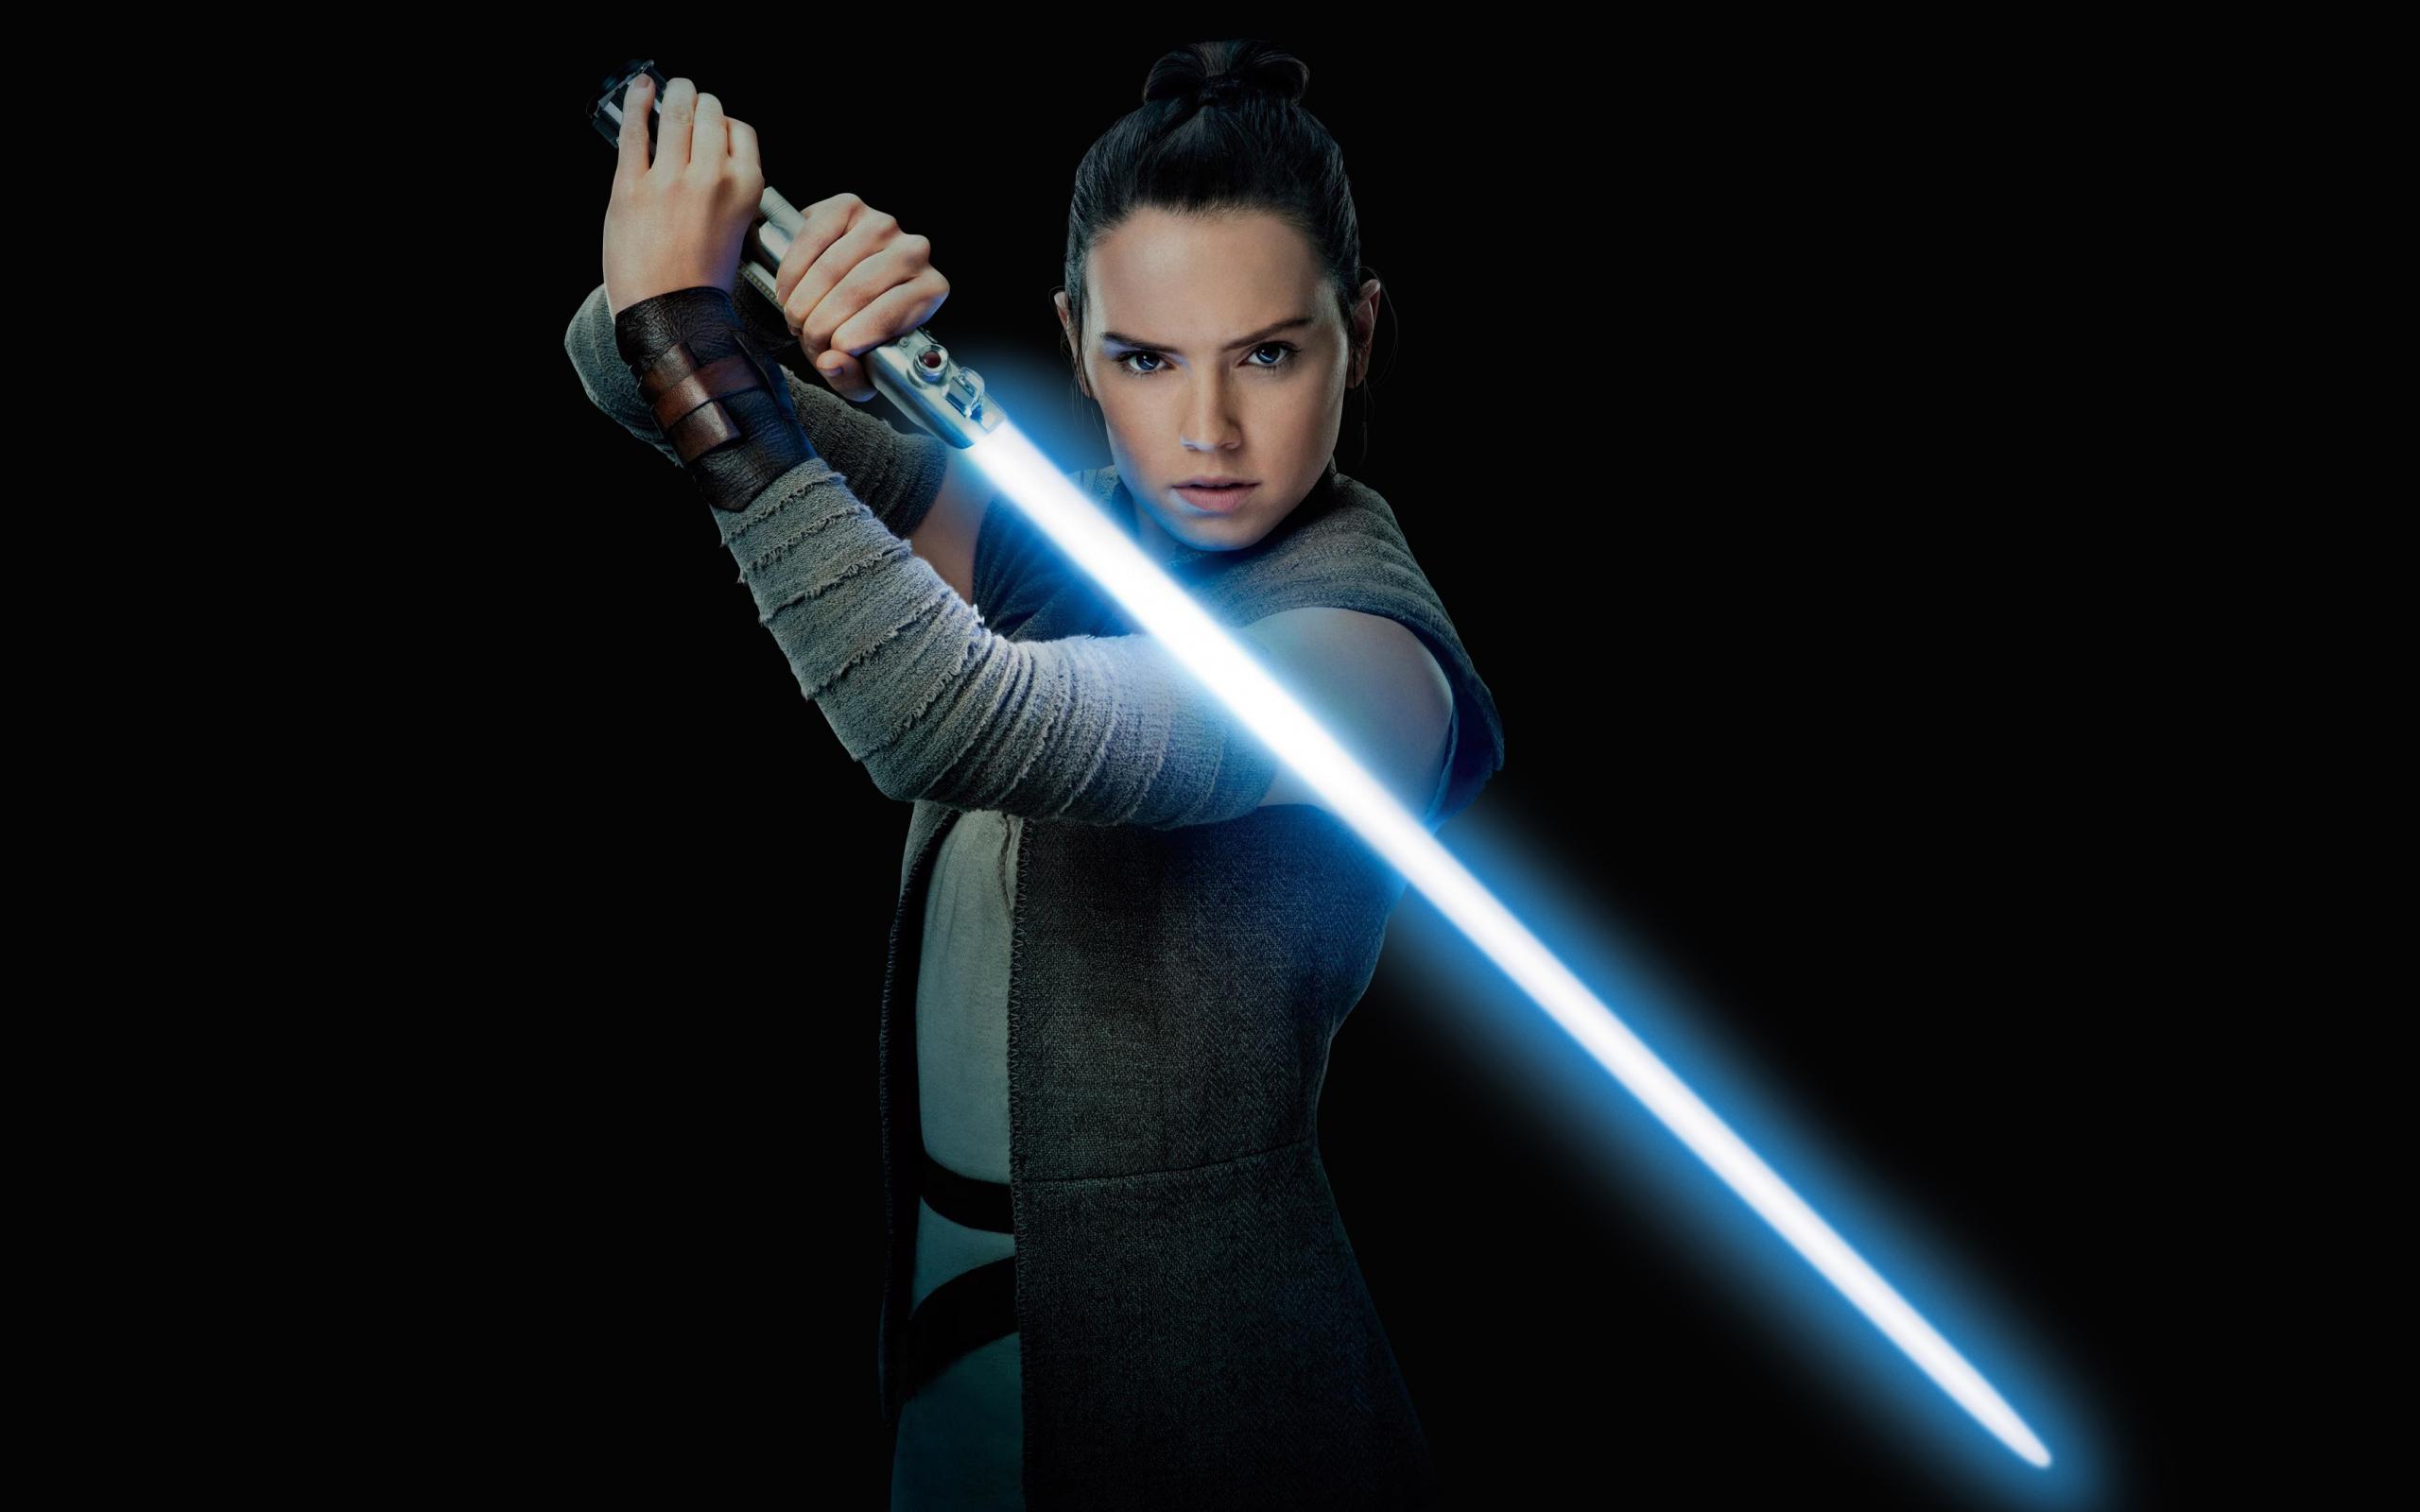 Daisy Ridley Rey Star Wars The Last Jedi Movie Actress